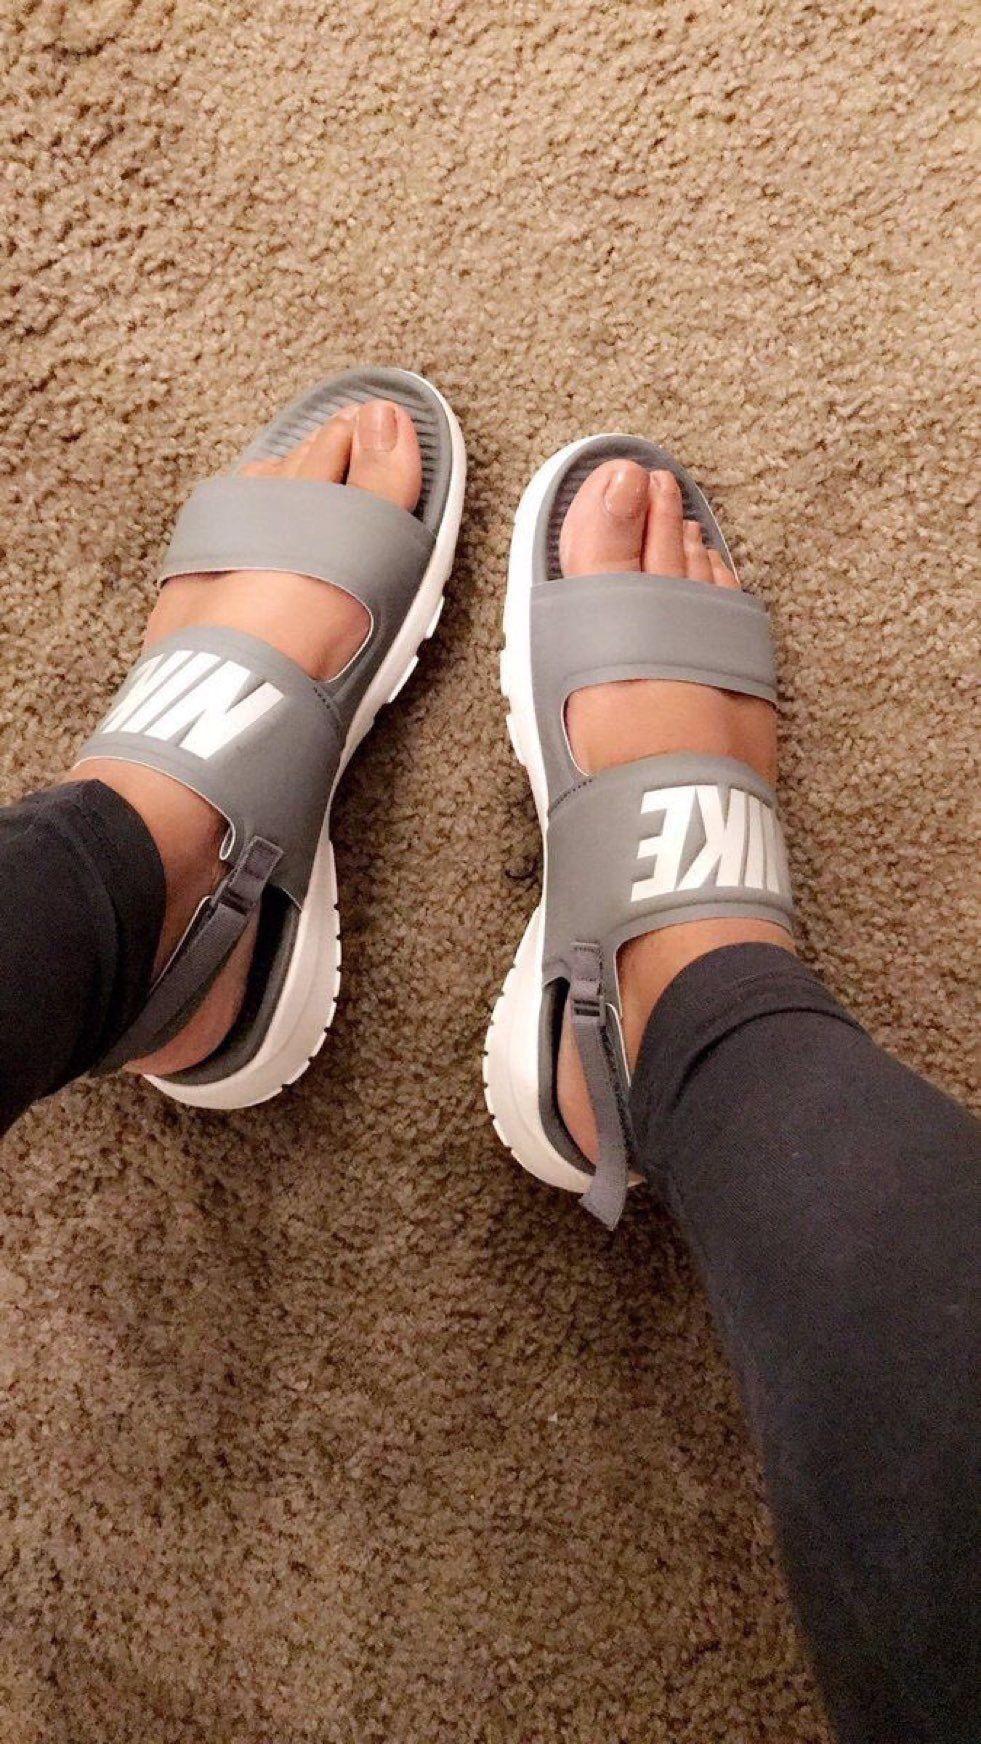 Nike Tanjun Sandal | Hype shoes, Womens